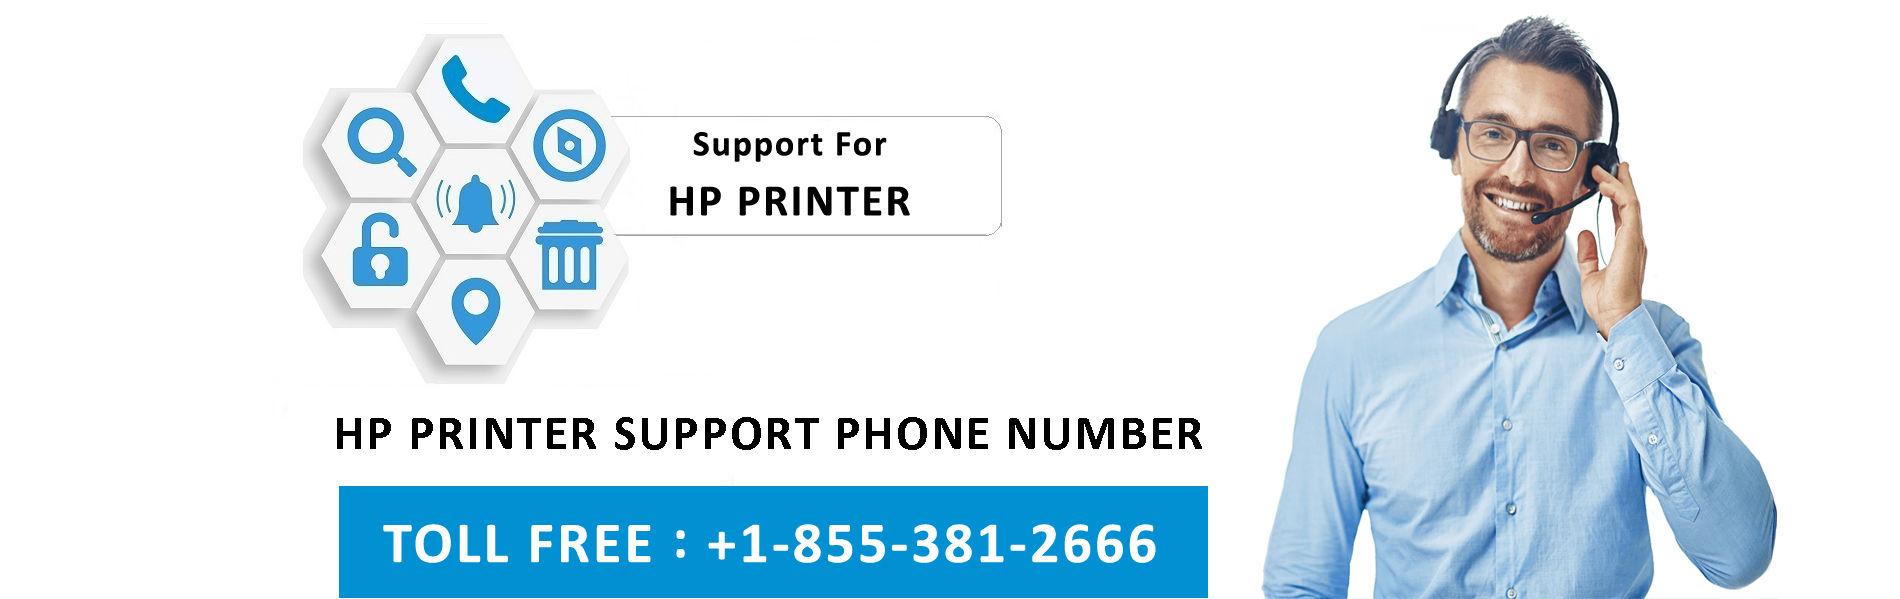 HP Printer Support Phone Number +1-855-381-2666 Toll Free Helpline